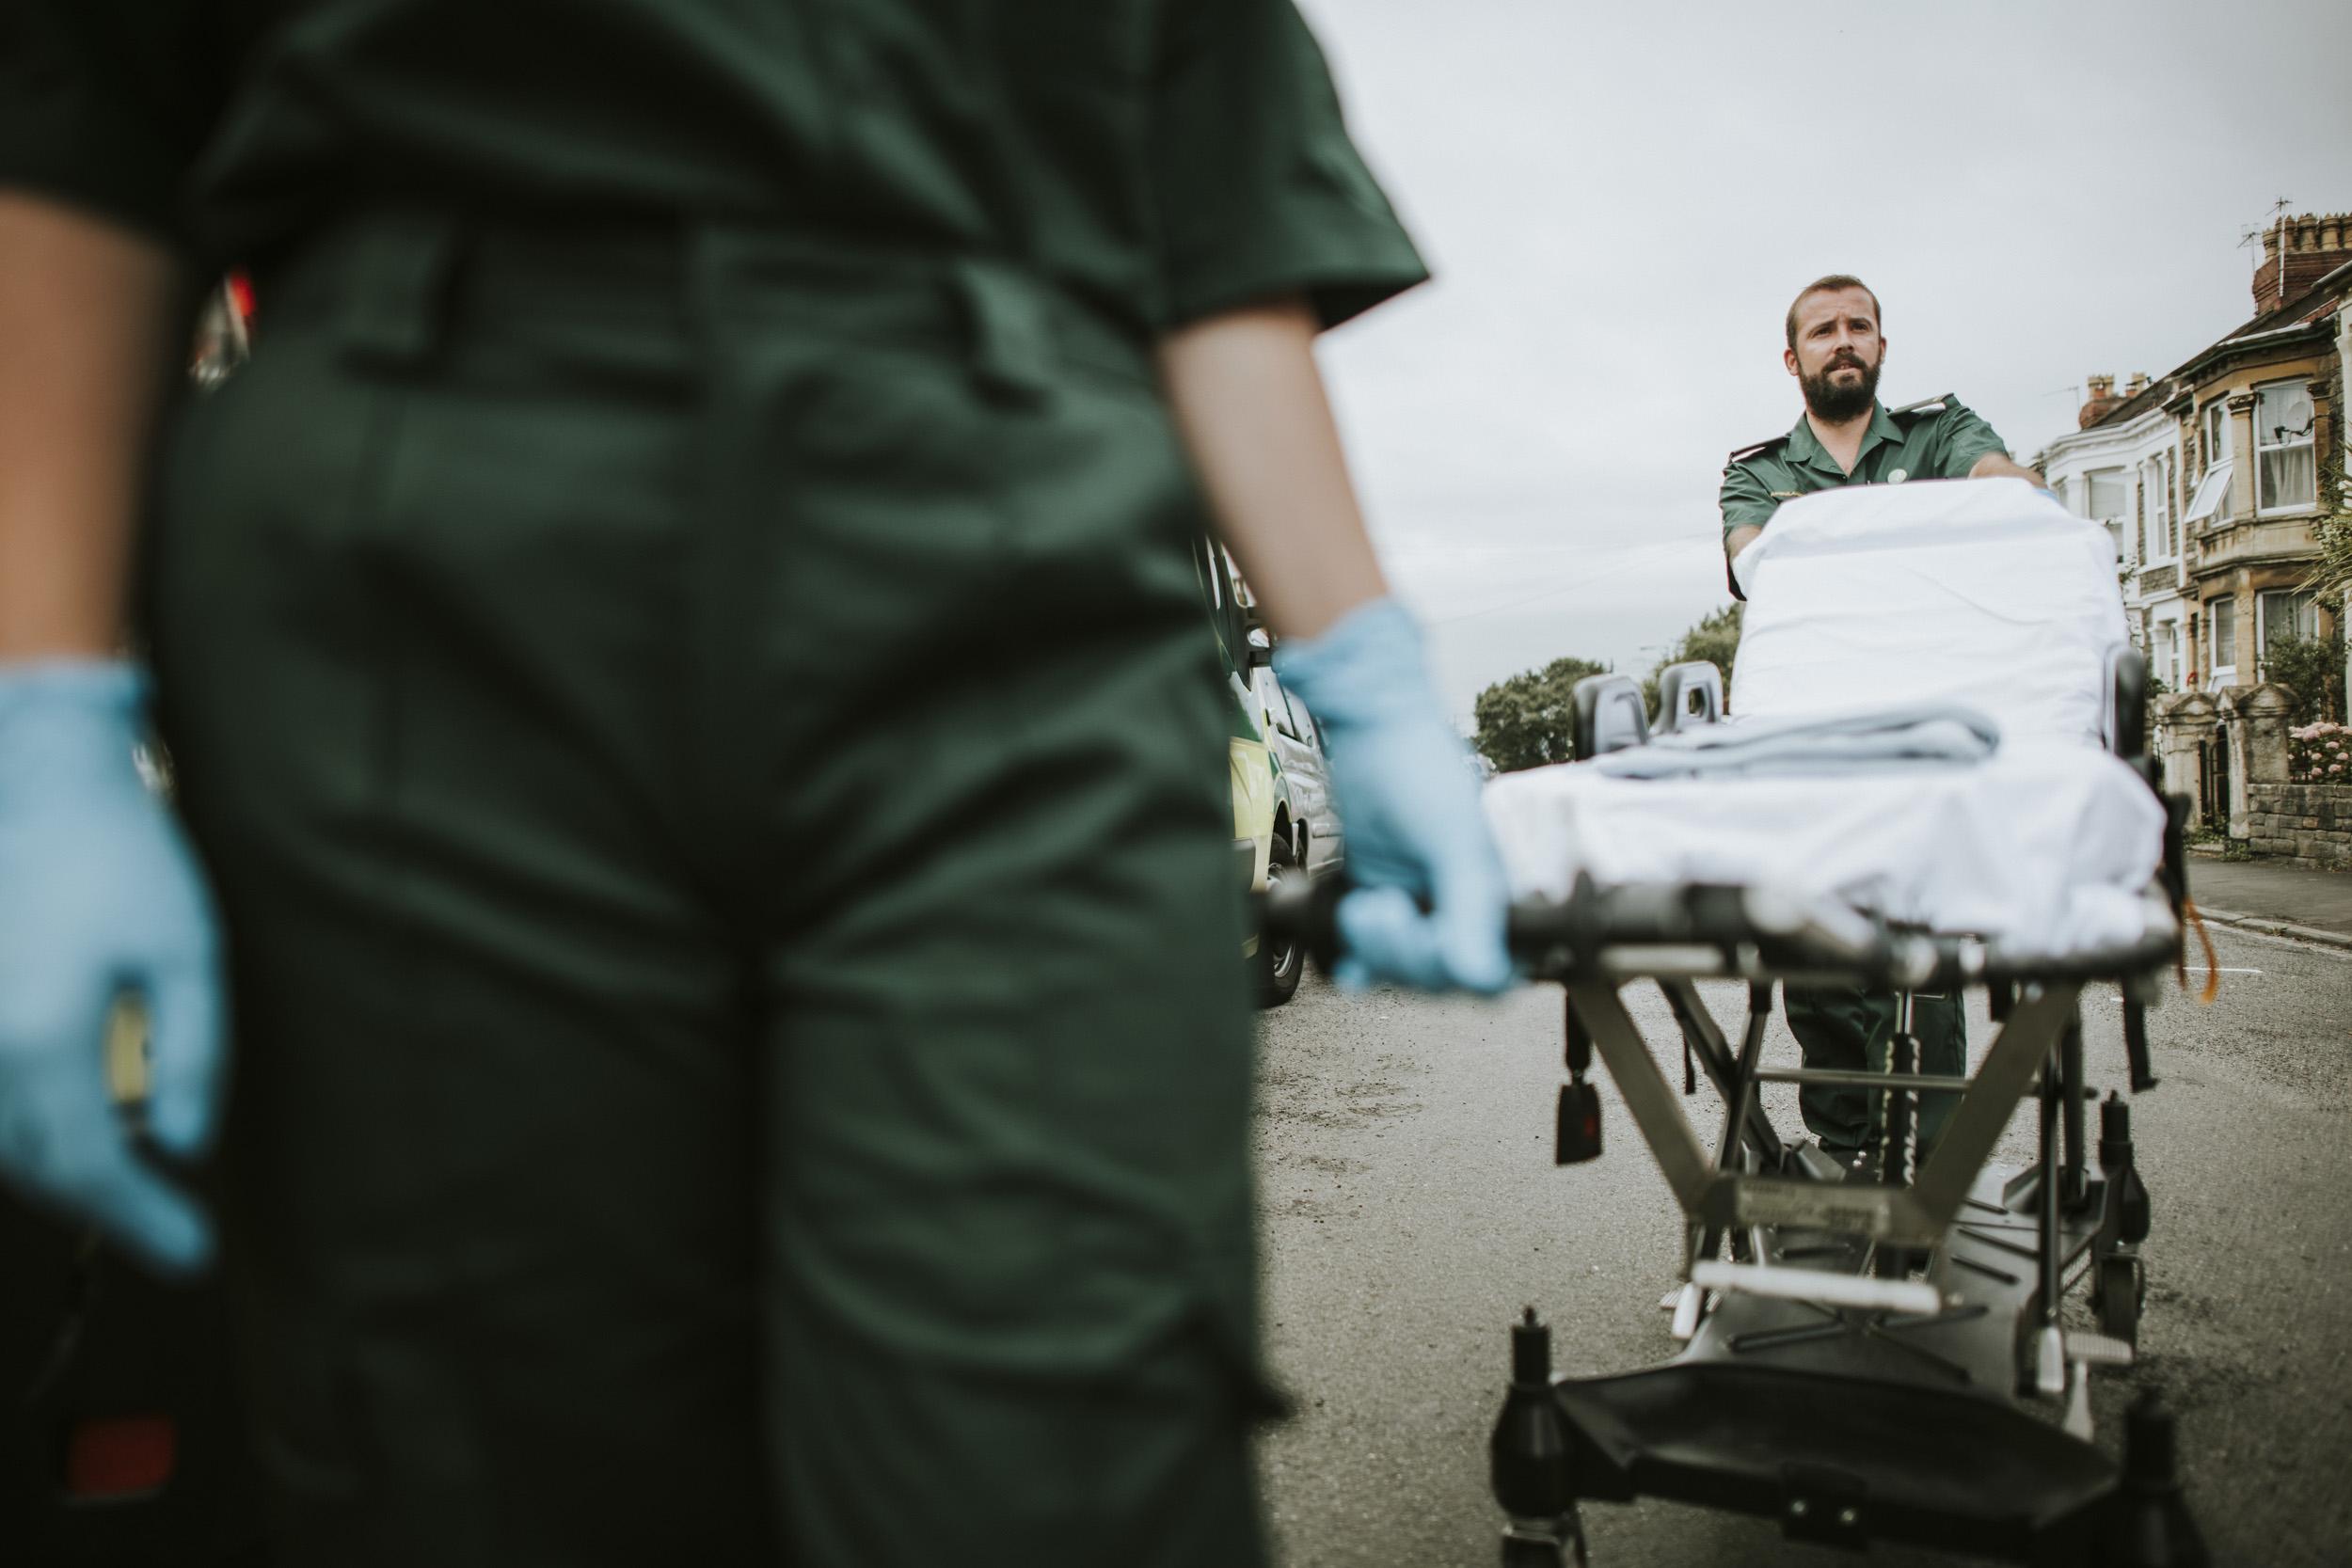 Paramedic team rolling a stretcher on a street